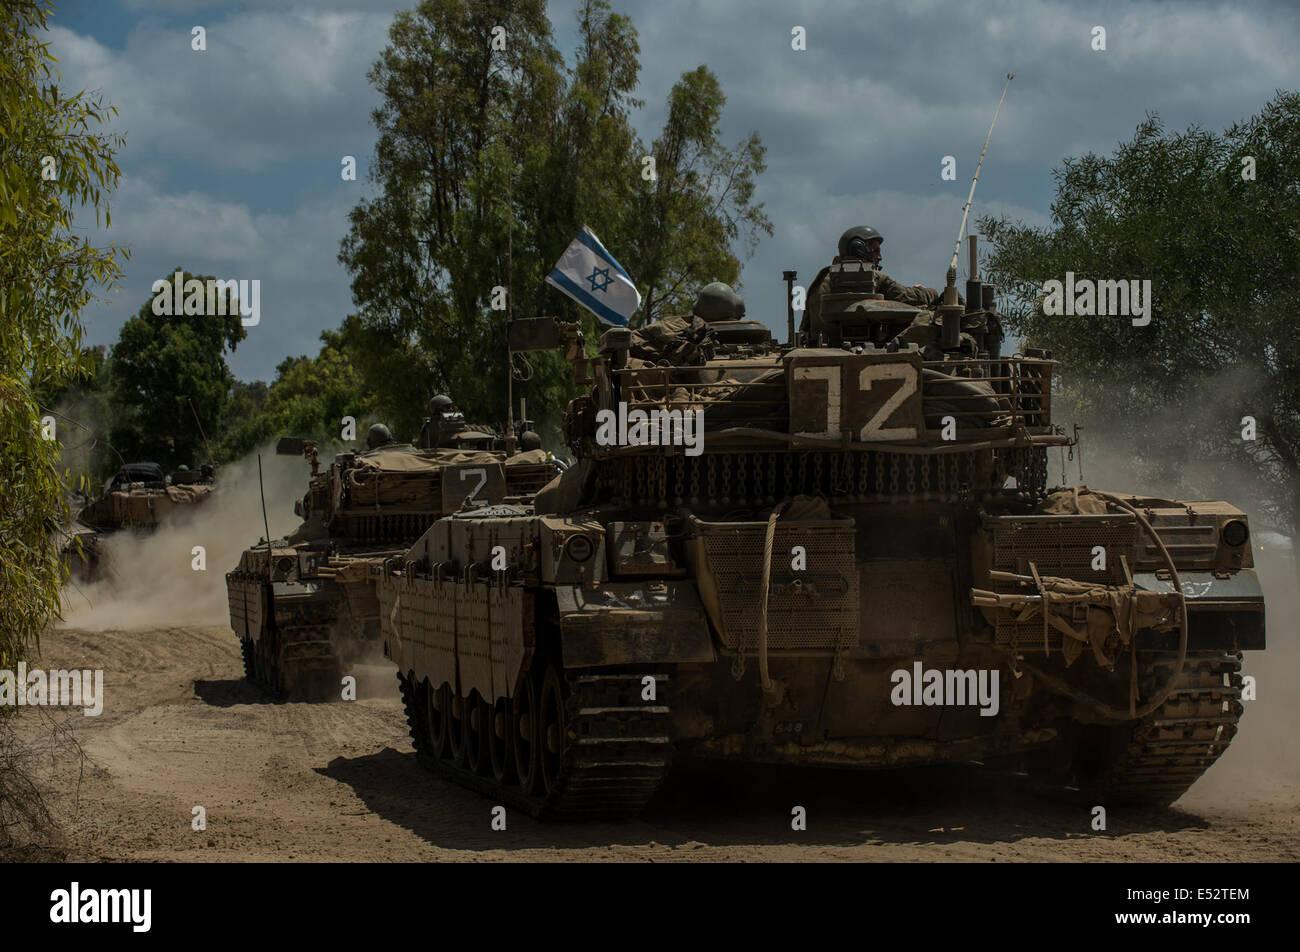 Gaza Border. 18th July, 2014. Israeli Markava tanks run in southern Israel near the border with Gaza, on July 18, - Stock Image